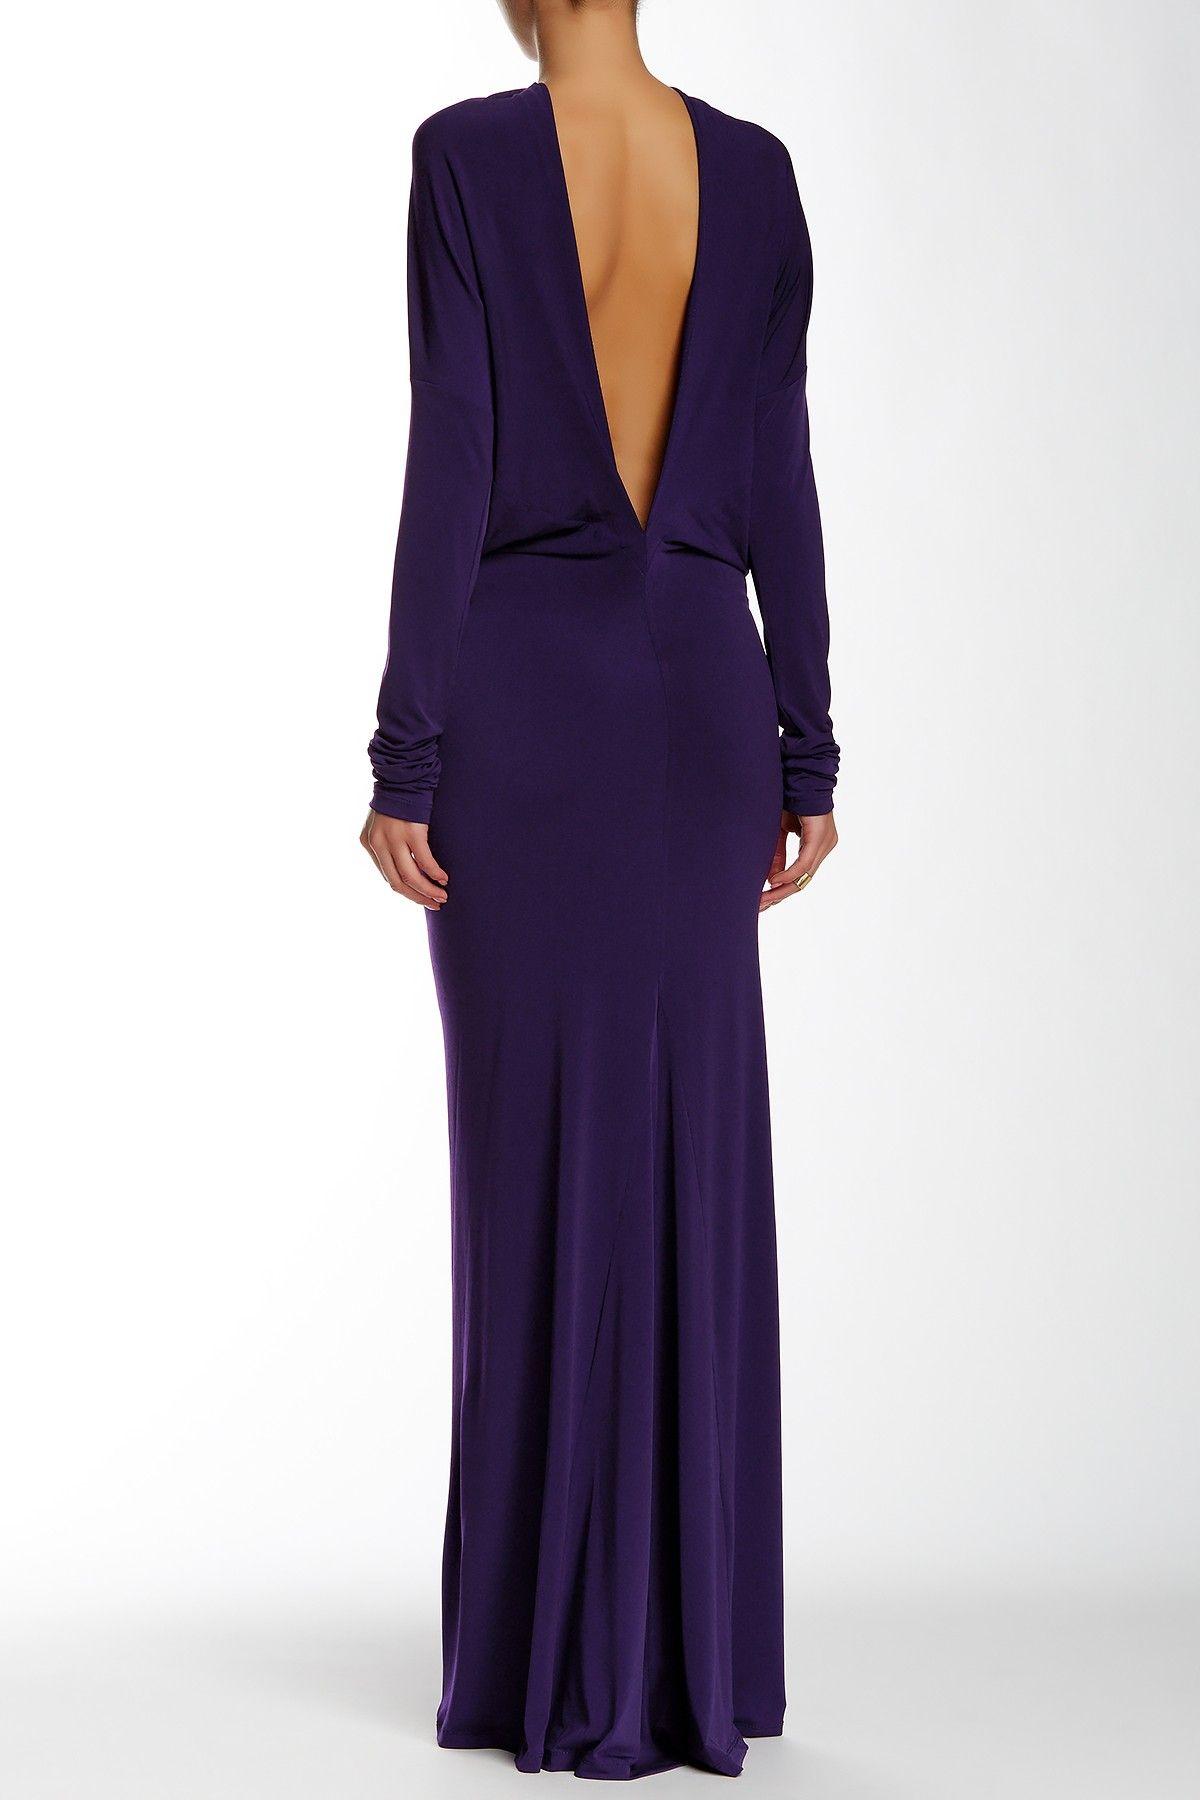 Dolman Sleeve Purple Formal Dresses